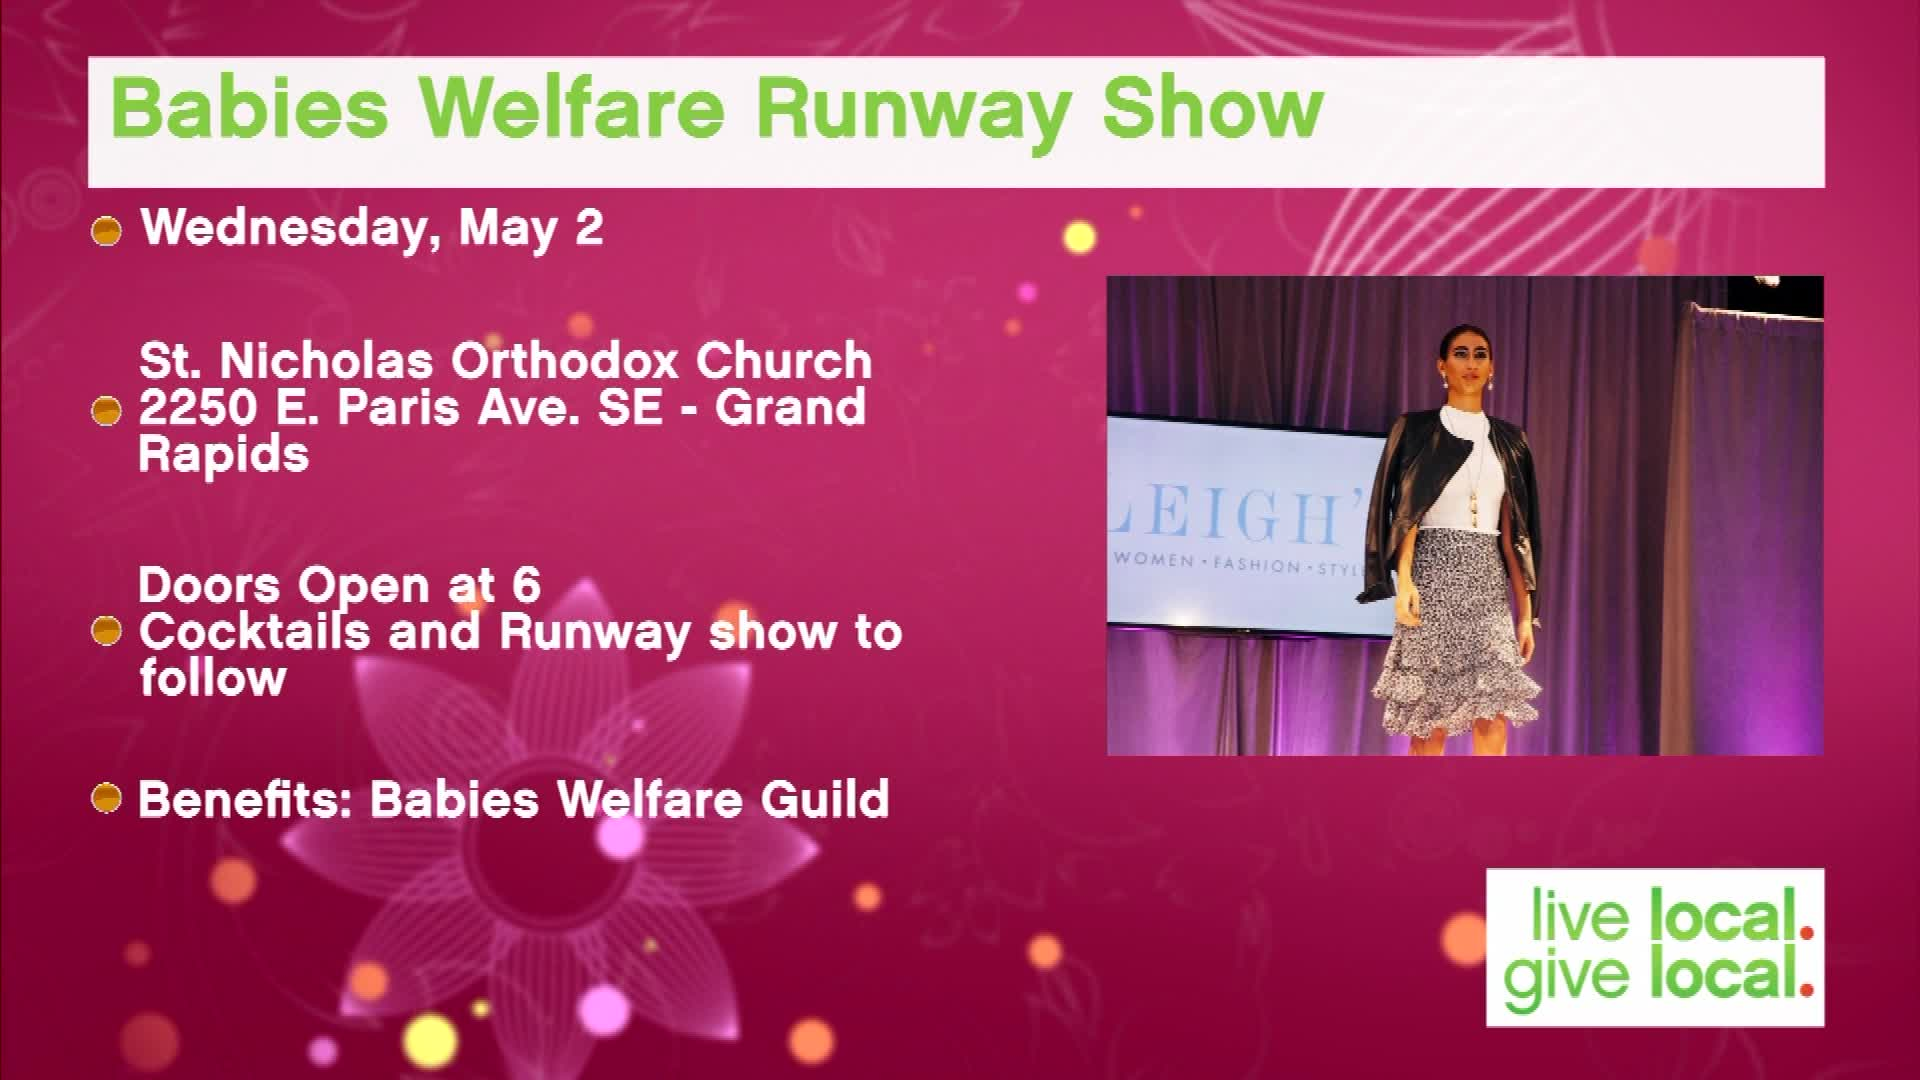 Baby Wellfare Guild Runway show_65179